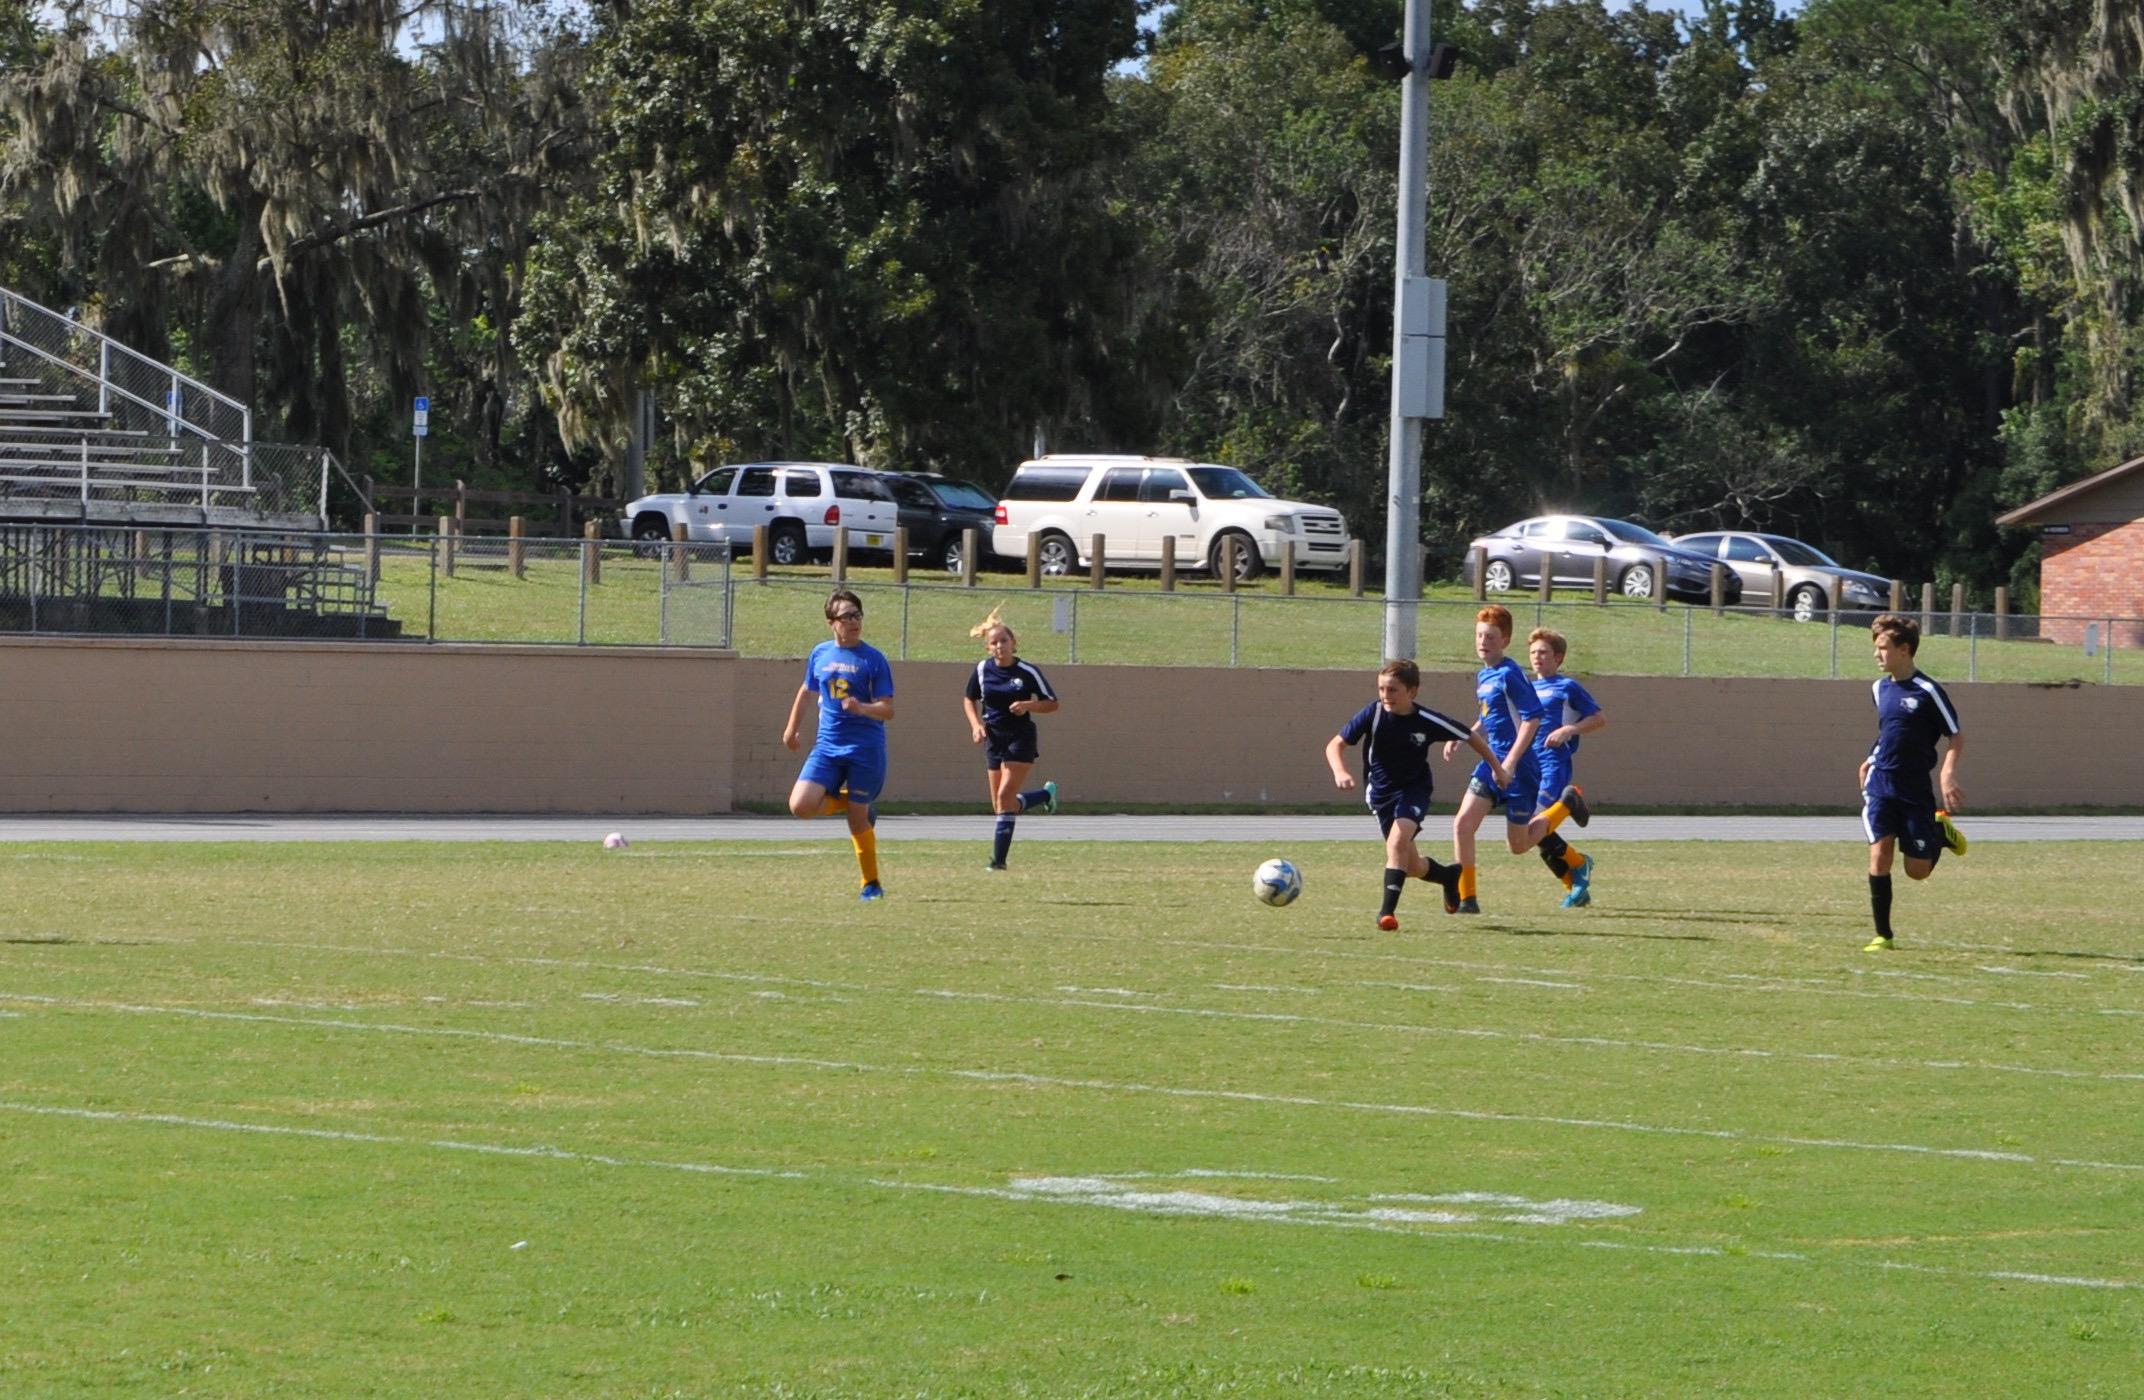 Cougar Athletics - The Cornerstone School